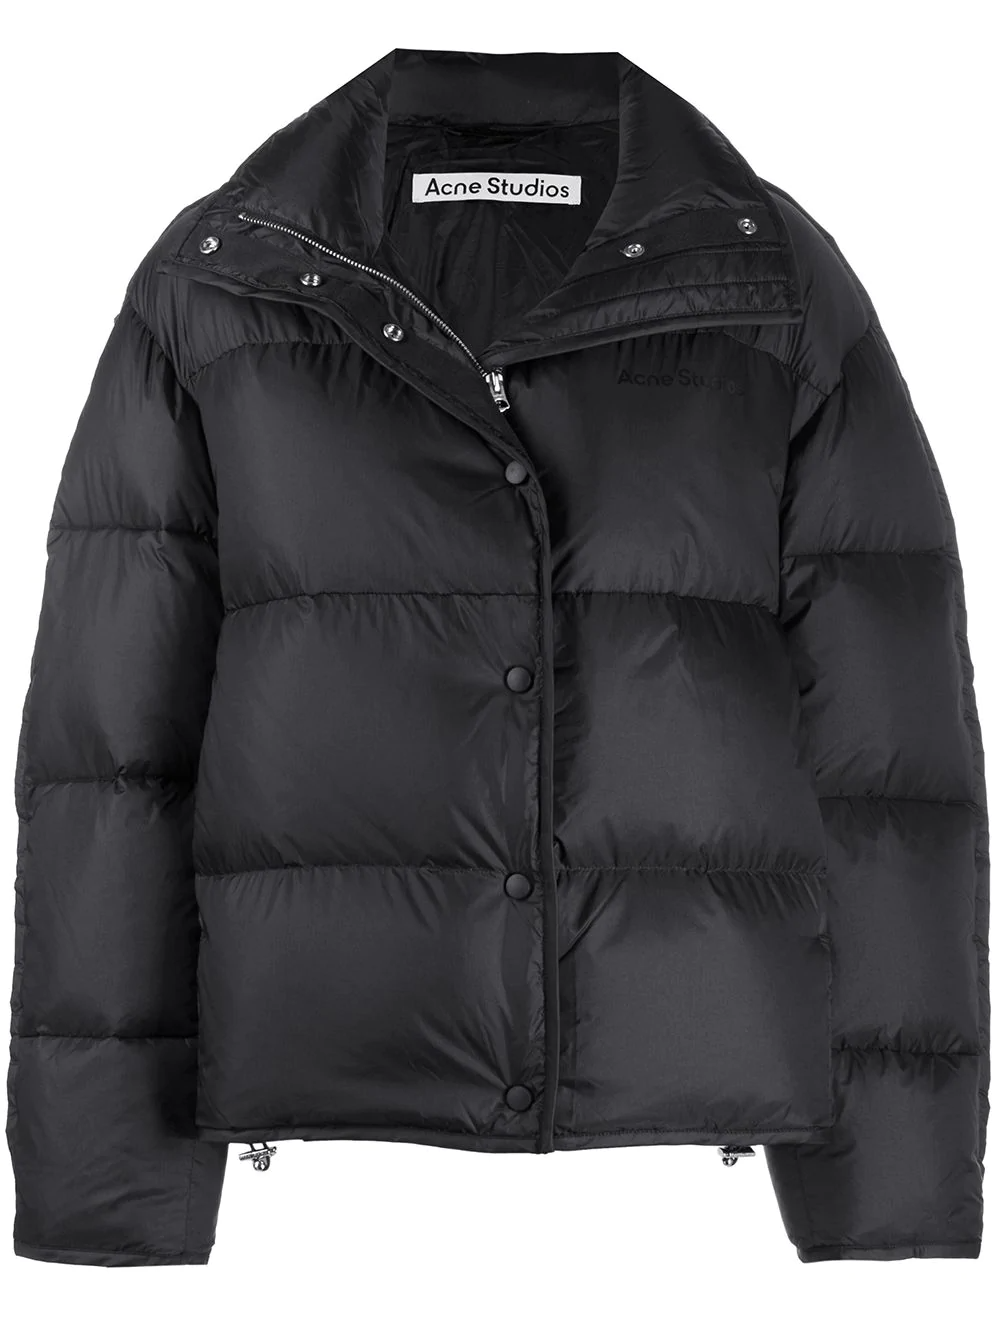 Acne Studios Classic Puffer Jacket Farfetch Acne Studios Puffer Jackets